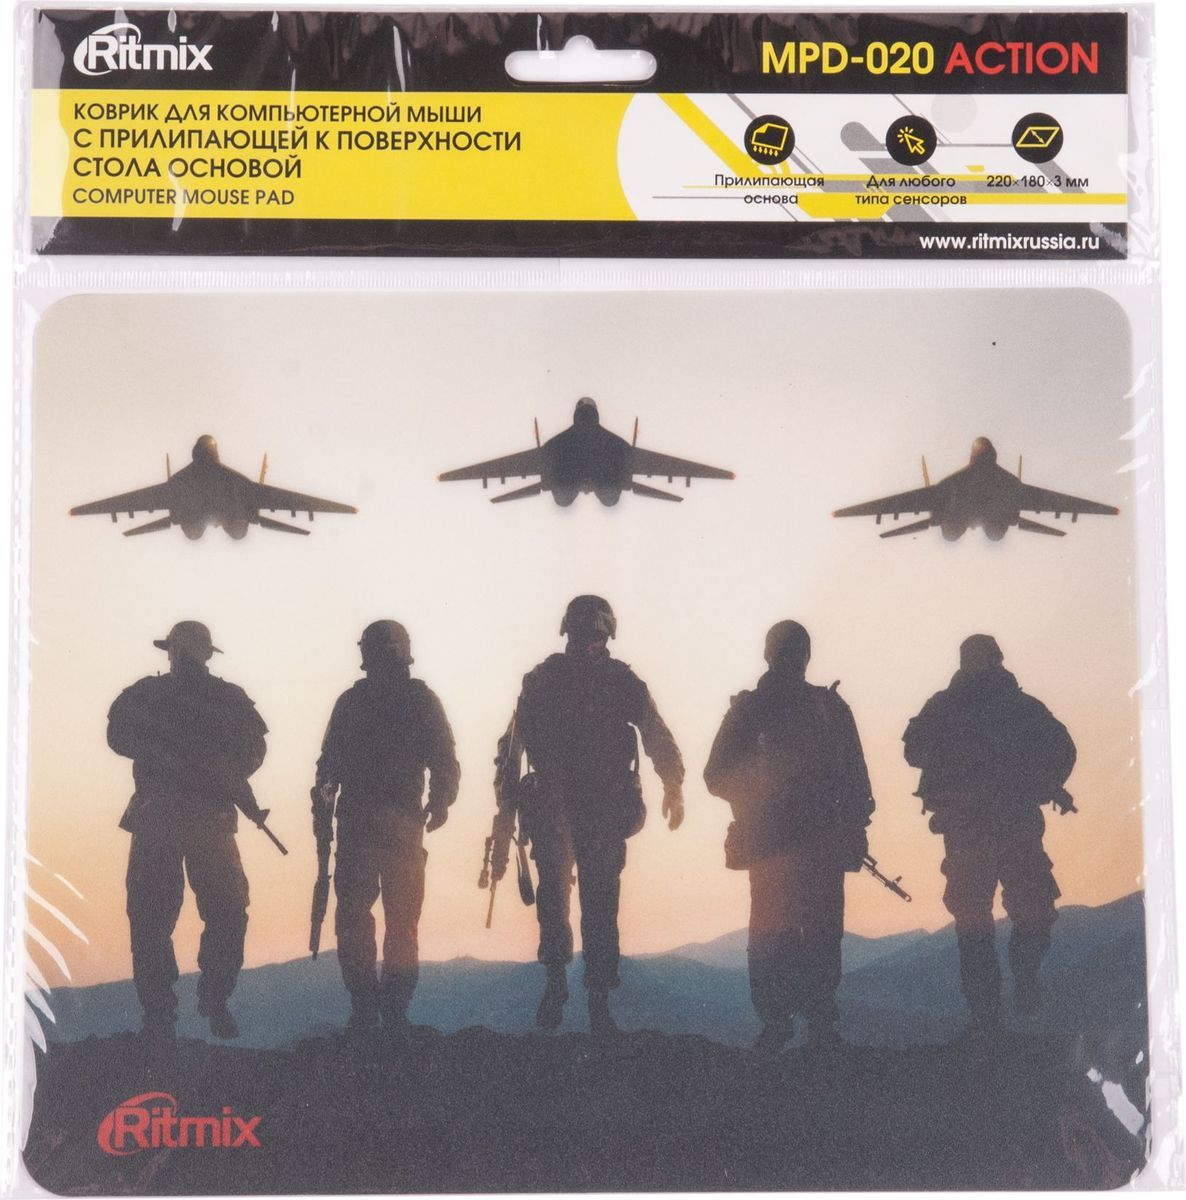 Коврик для мыши Ritmix MPD-020 Action коврик для мыши ritmix mpd 030 action